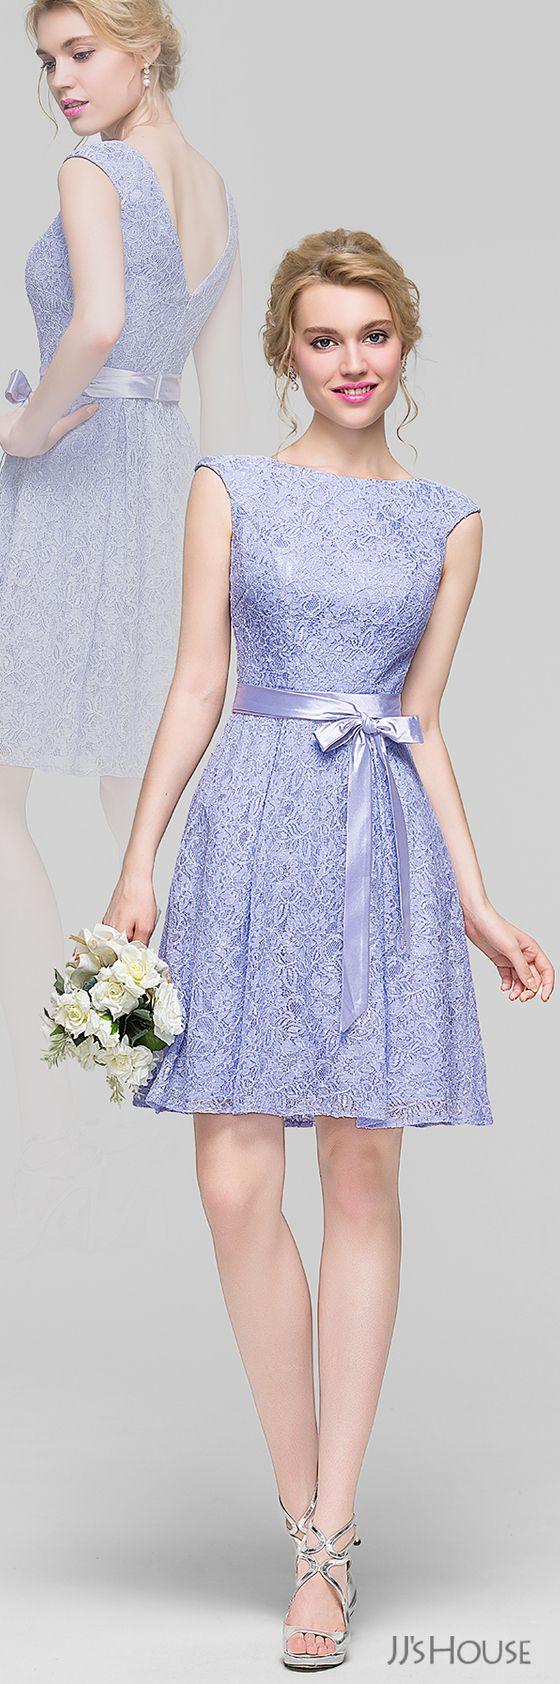 best ropa images on pinterest classy dress feminine fashion